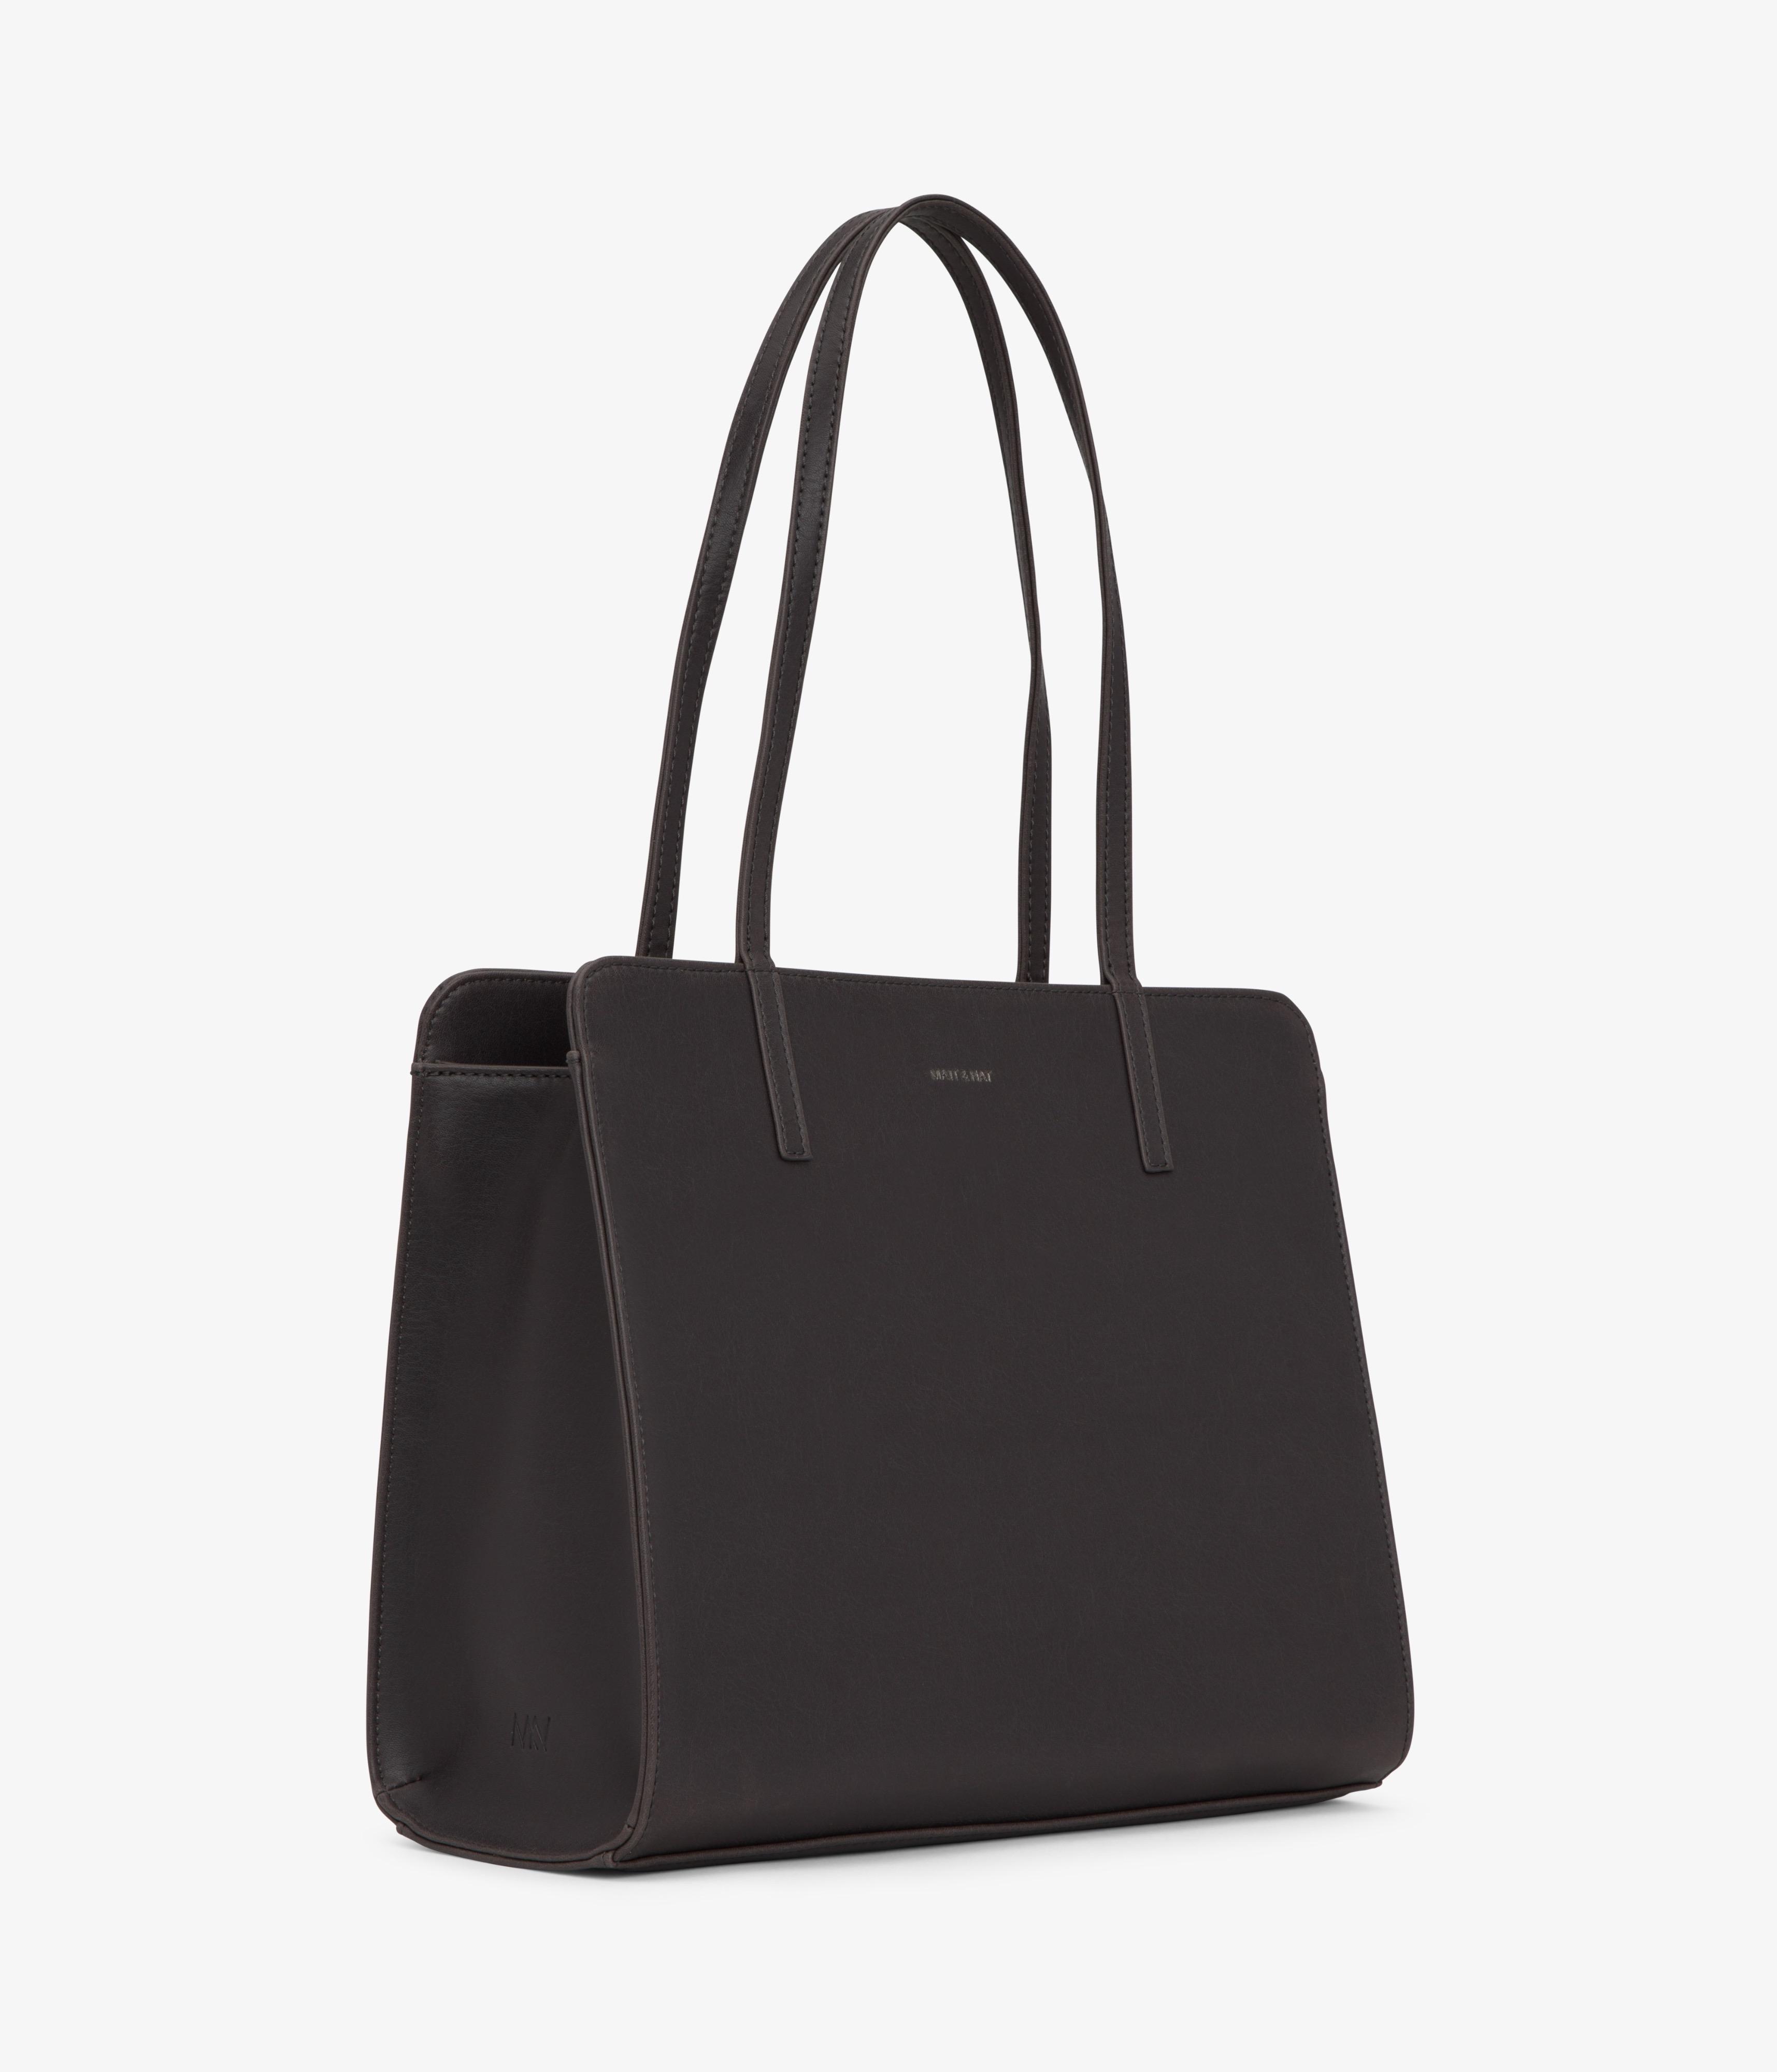 7a94b185b Trouva: Charcoal Grey Cara Vintage Tote Bag